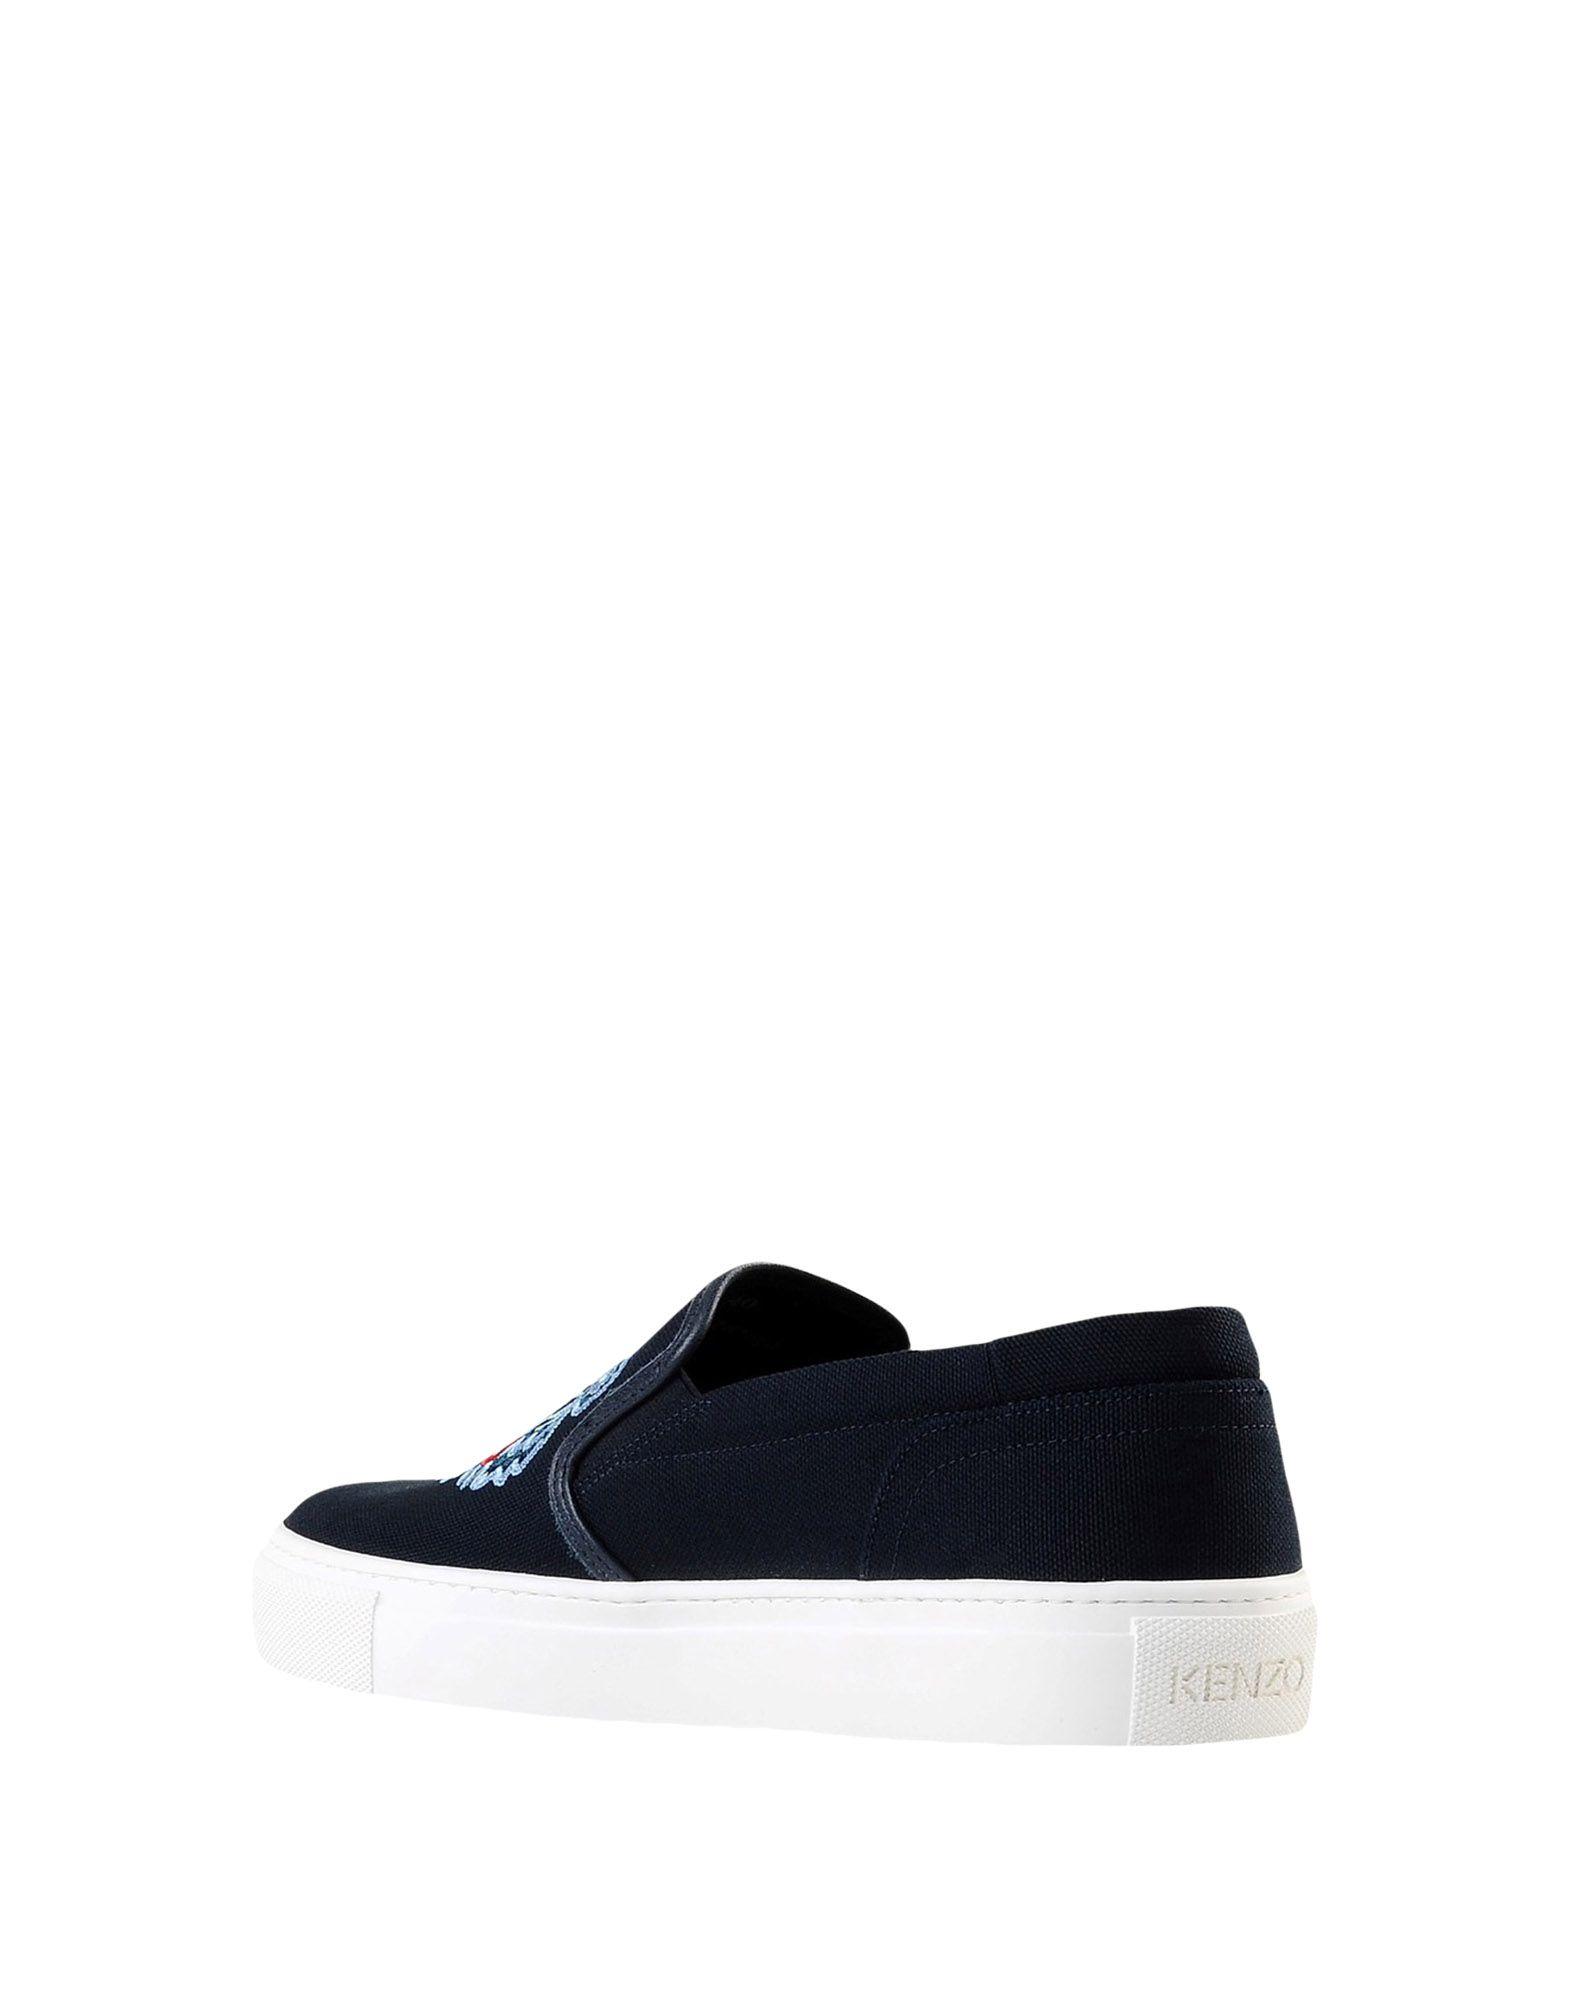 Stilvolle billige Schuhe Kenzo Sneakers Damen Damen Damen  11545185LD 341bd2